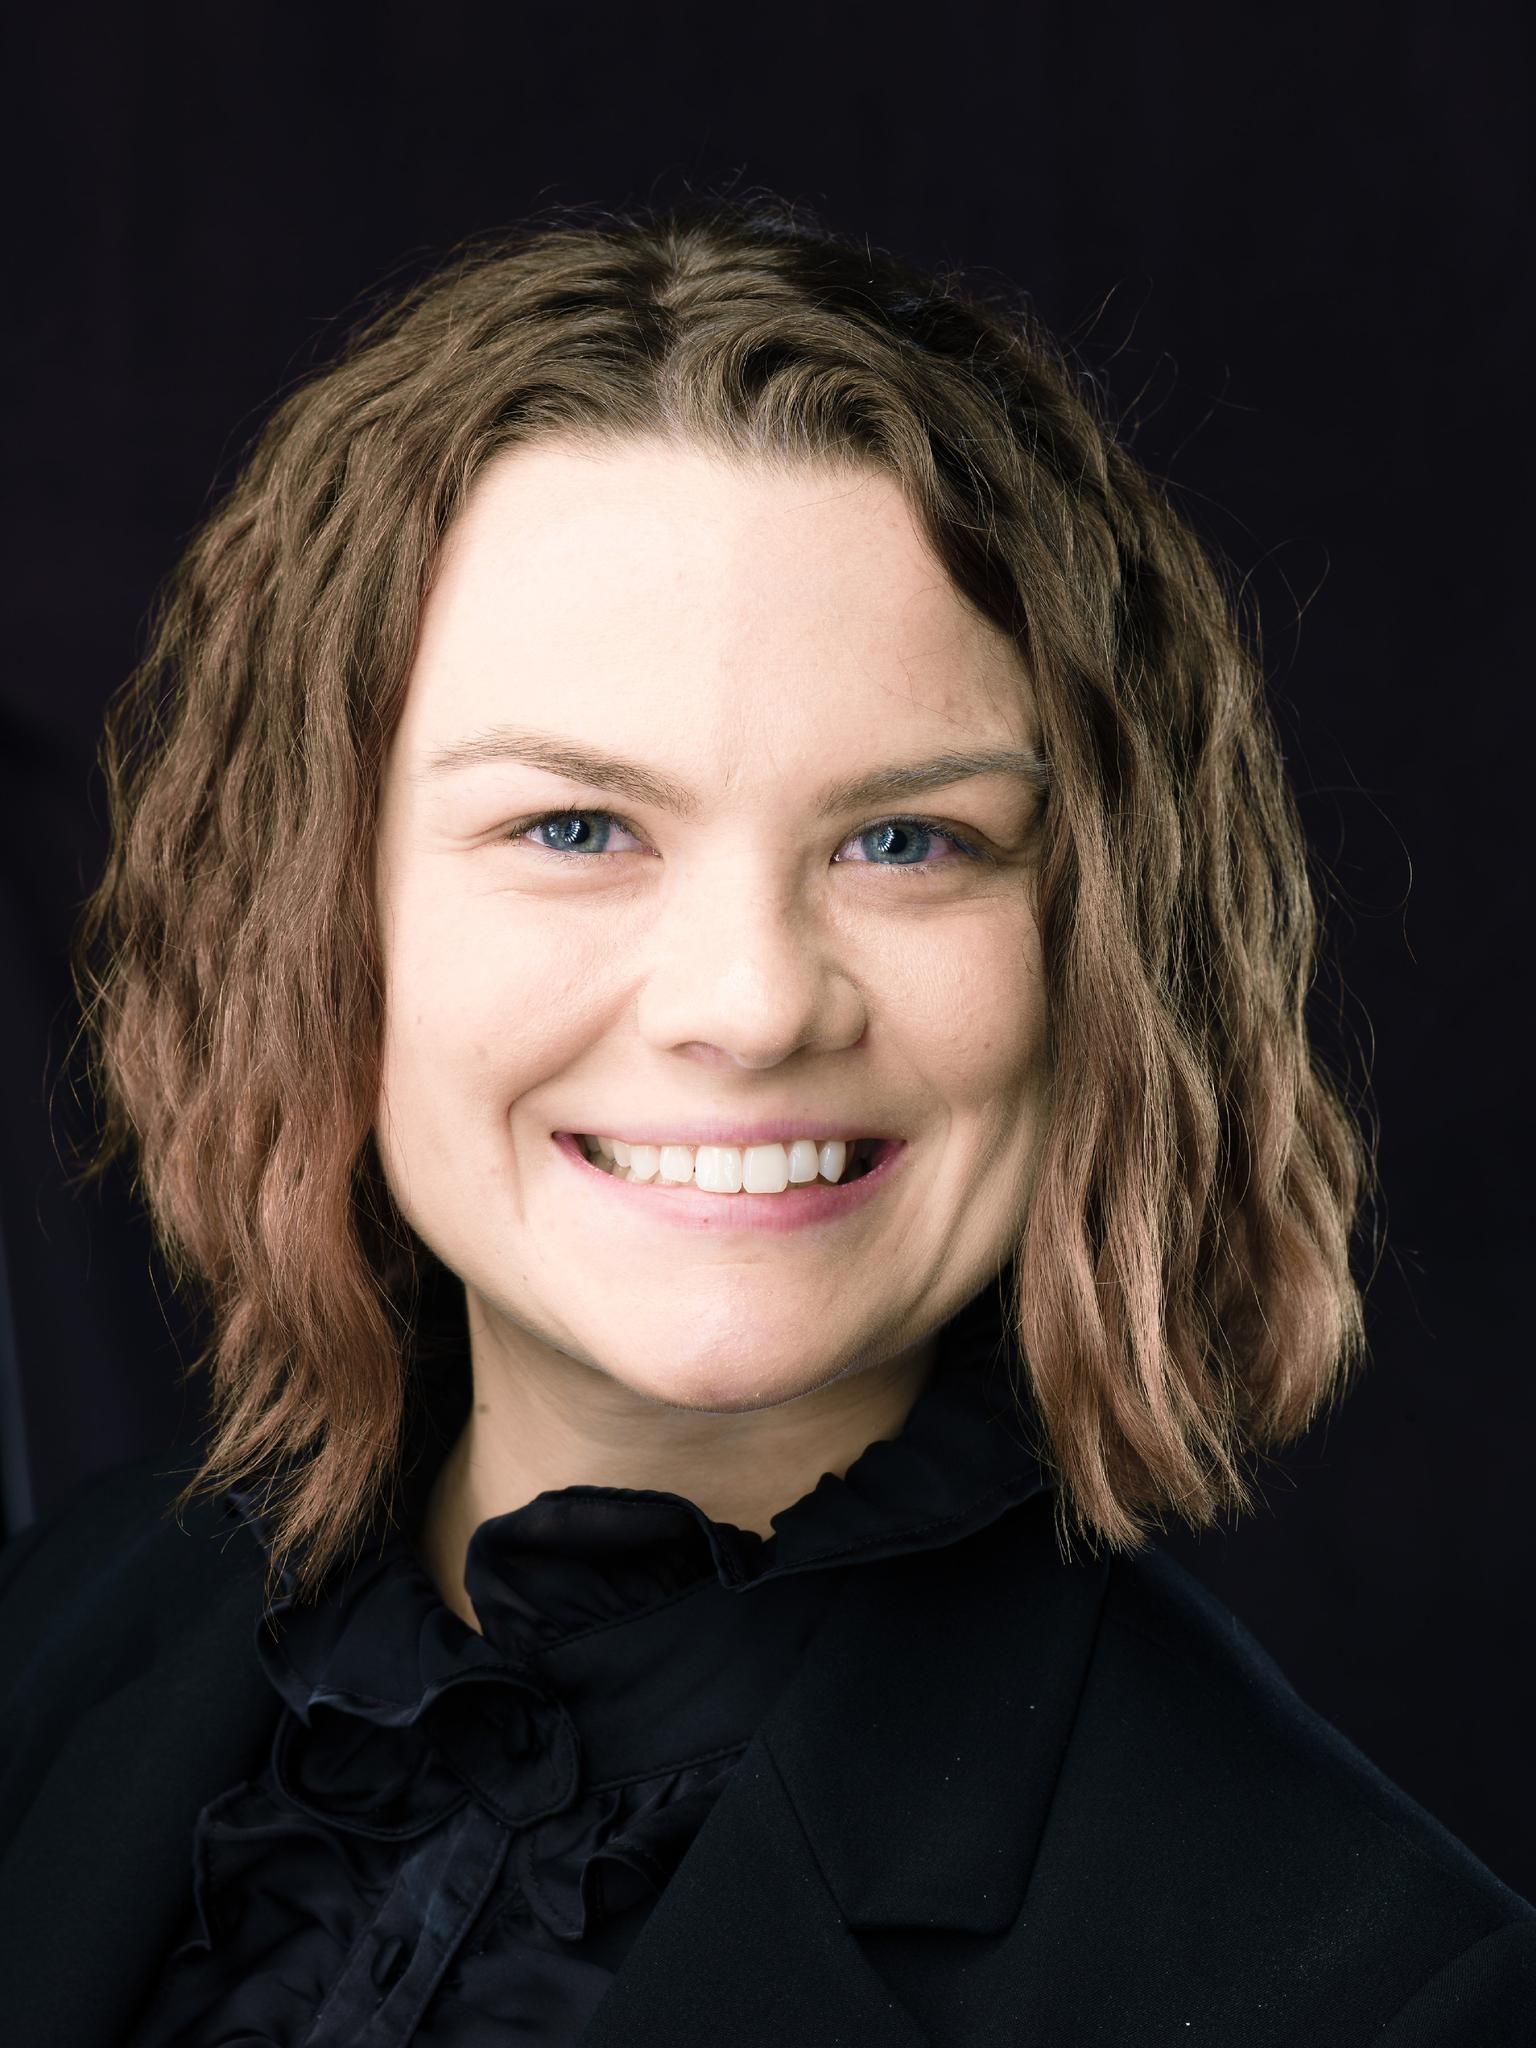 Katie Onufrey